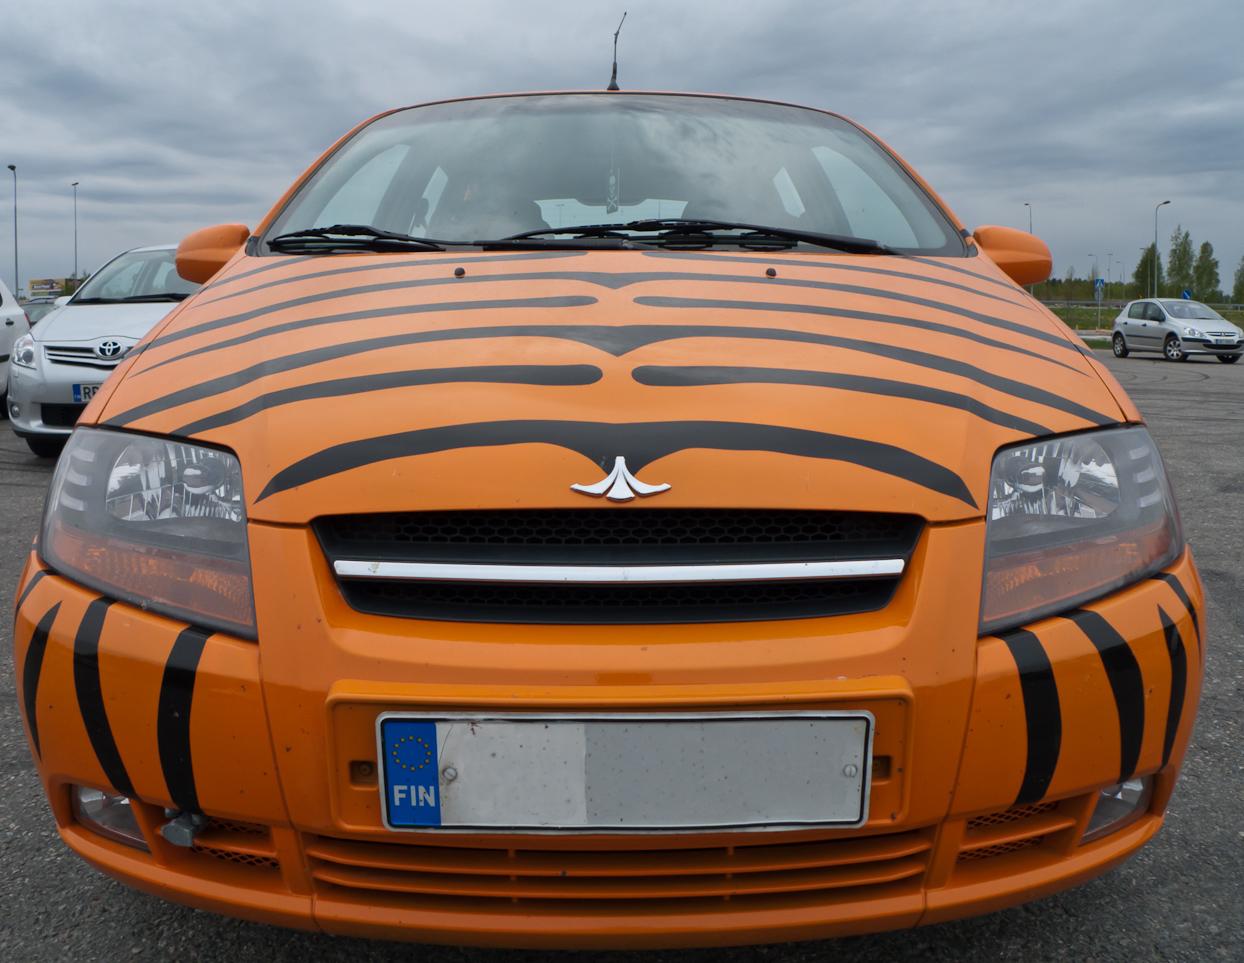 The Car, photo 173173, 2011-05-14